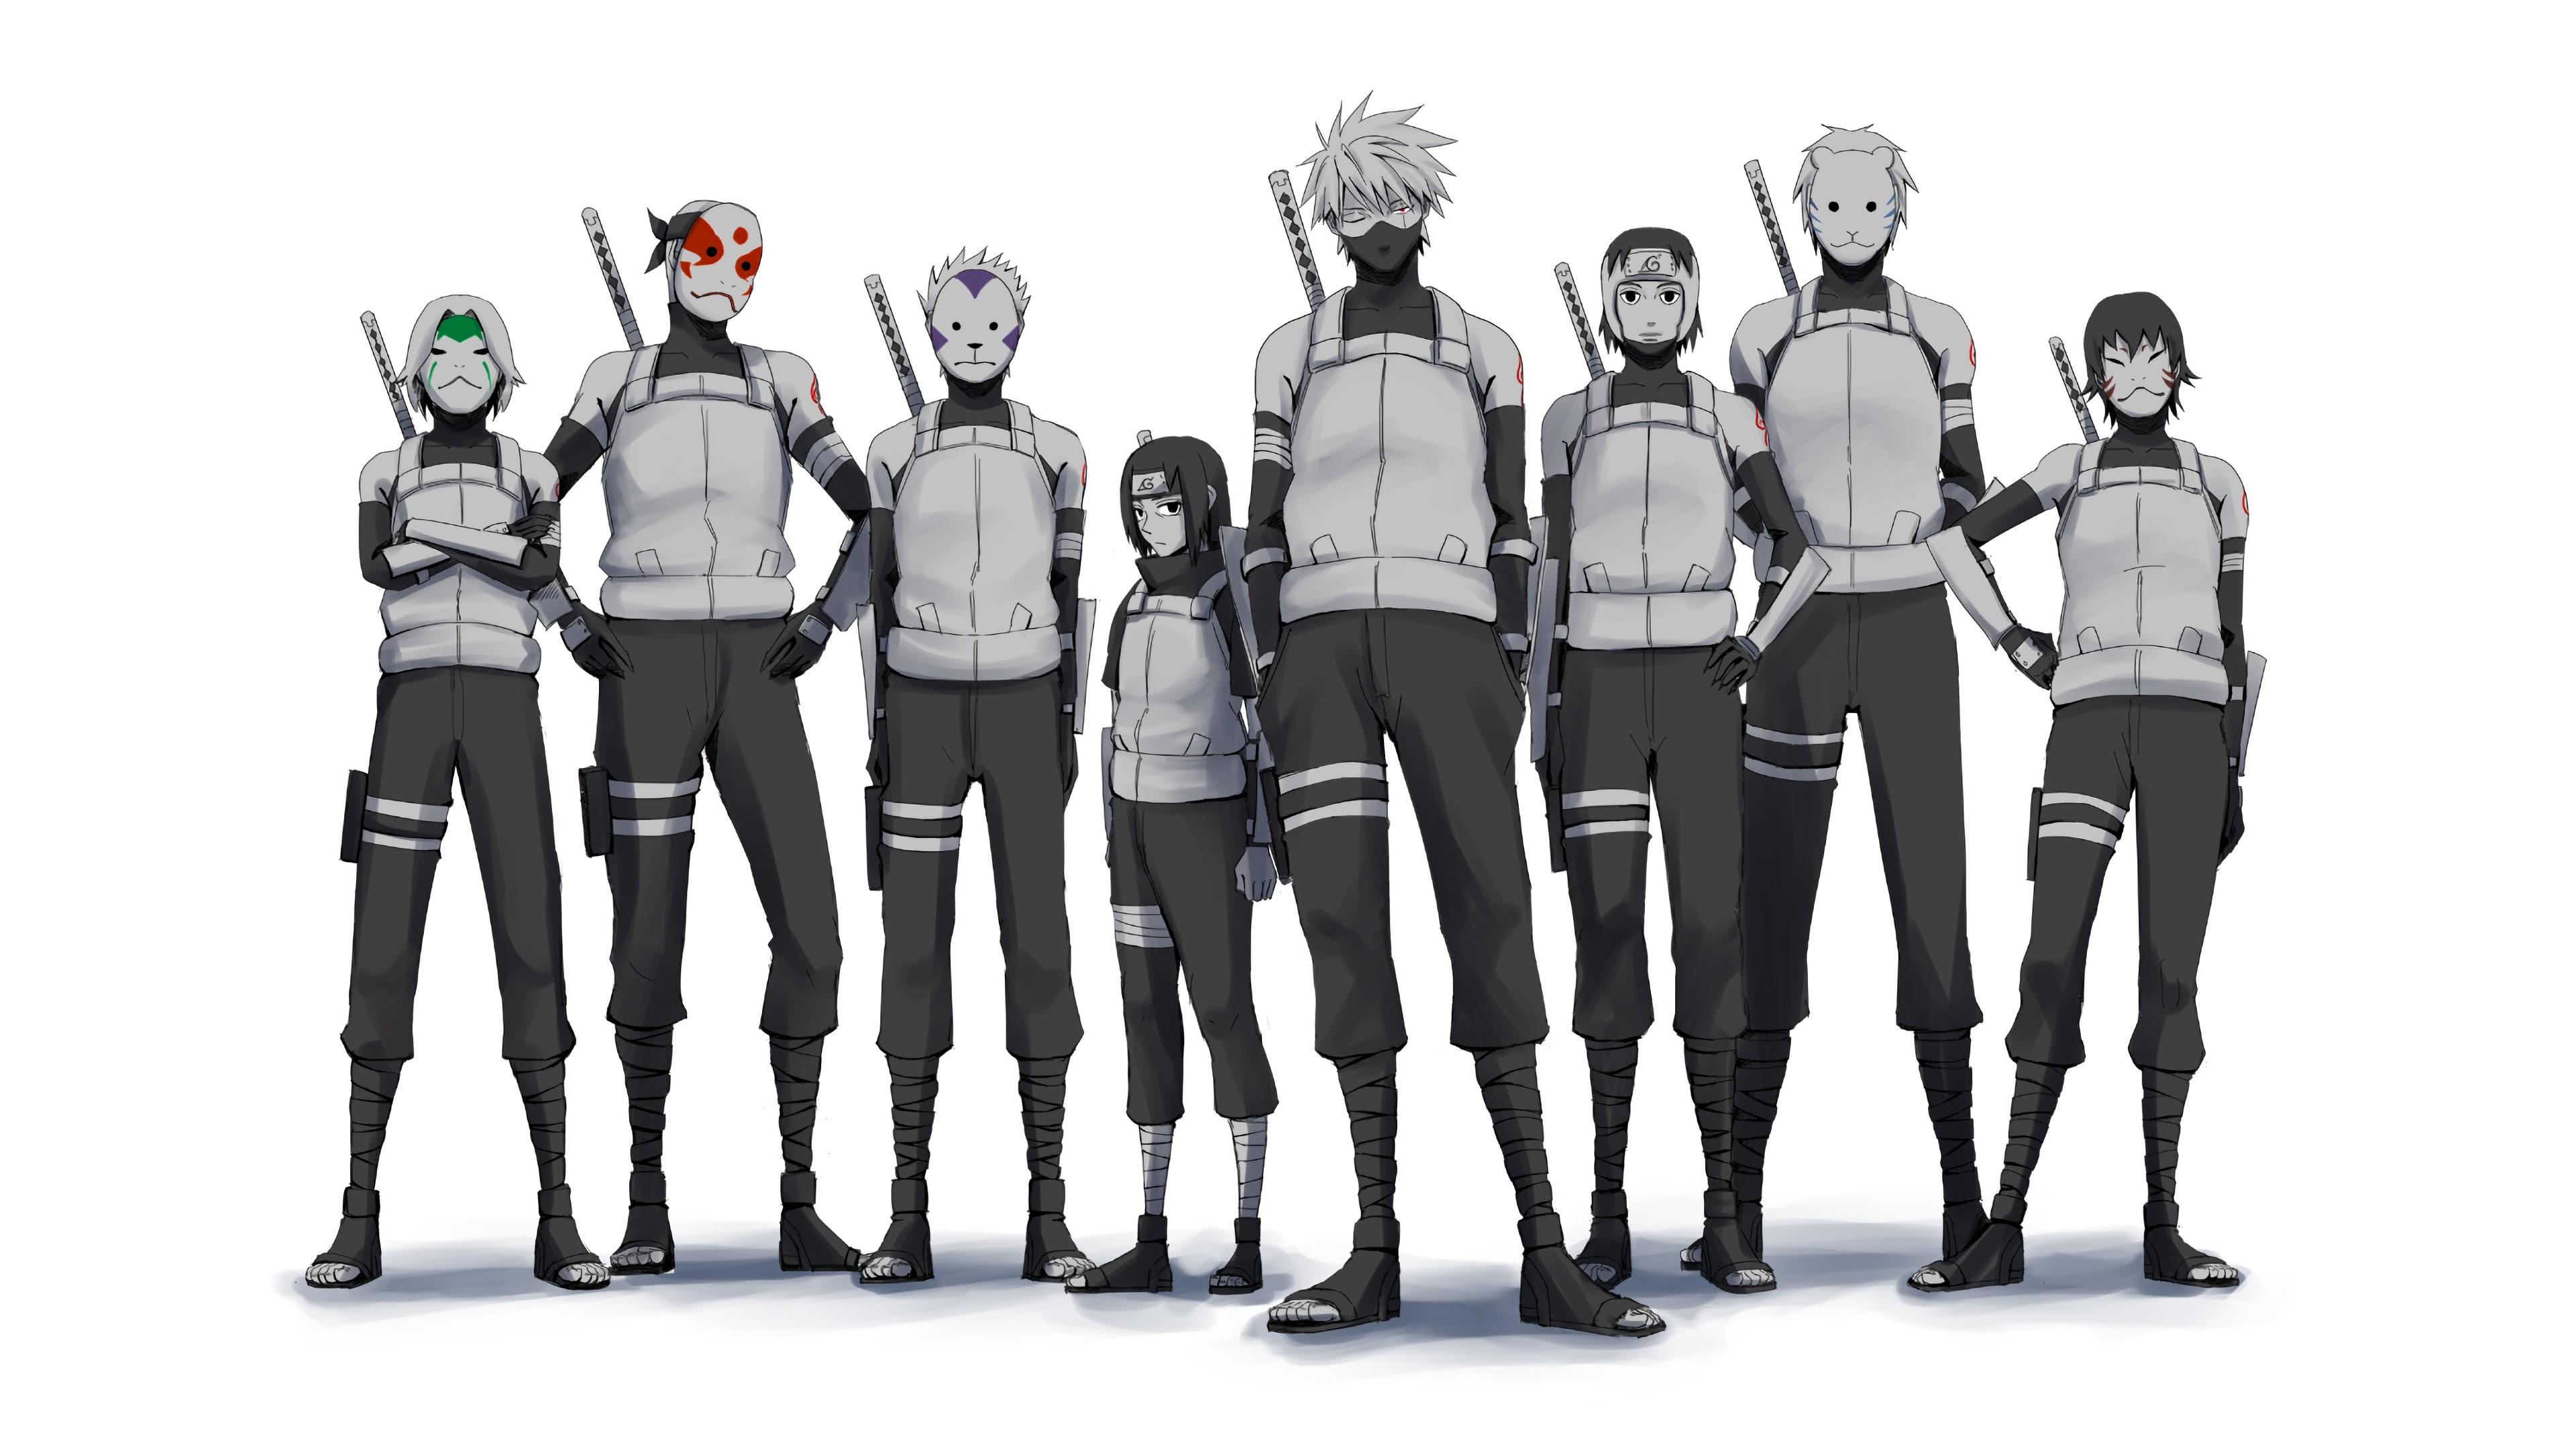 anbu squad kakashi itachi yamato naruto anime 4k uhdpaper.com 3